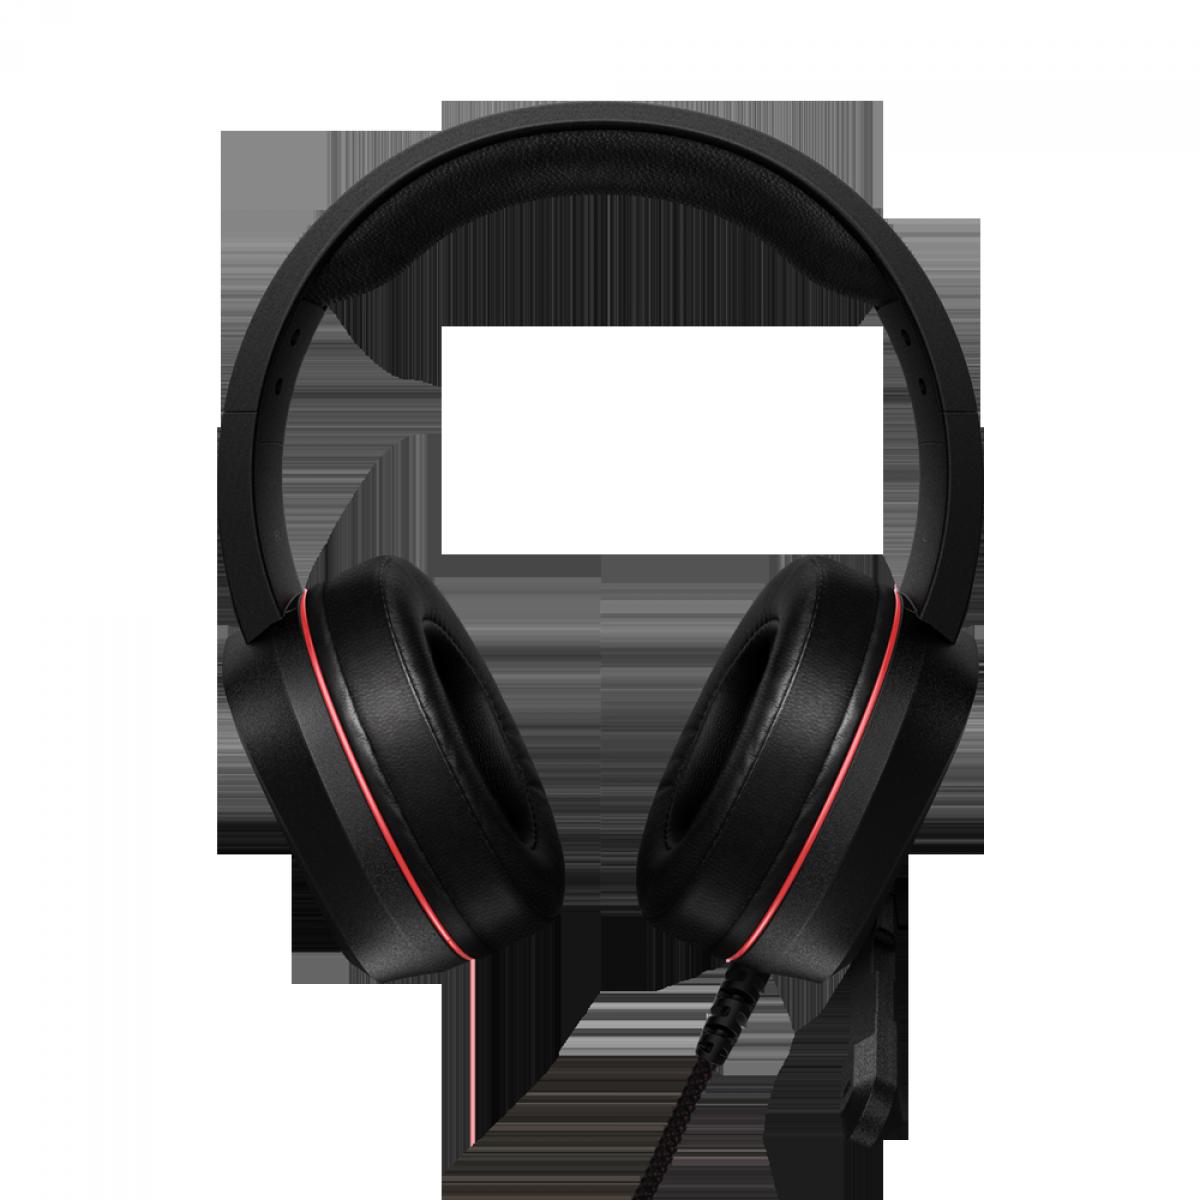 Headset Gamer XPG, Emix H20, 7.1 Virtual Surround, RGB, USB, Black/Red, 75260008